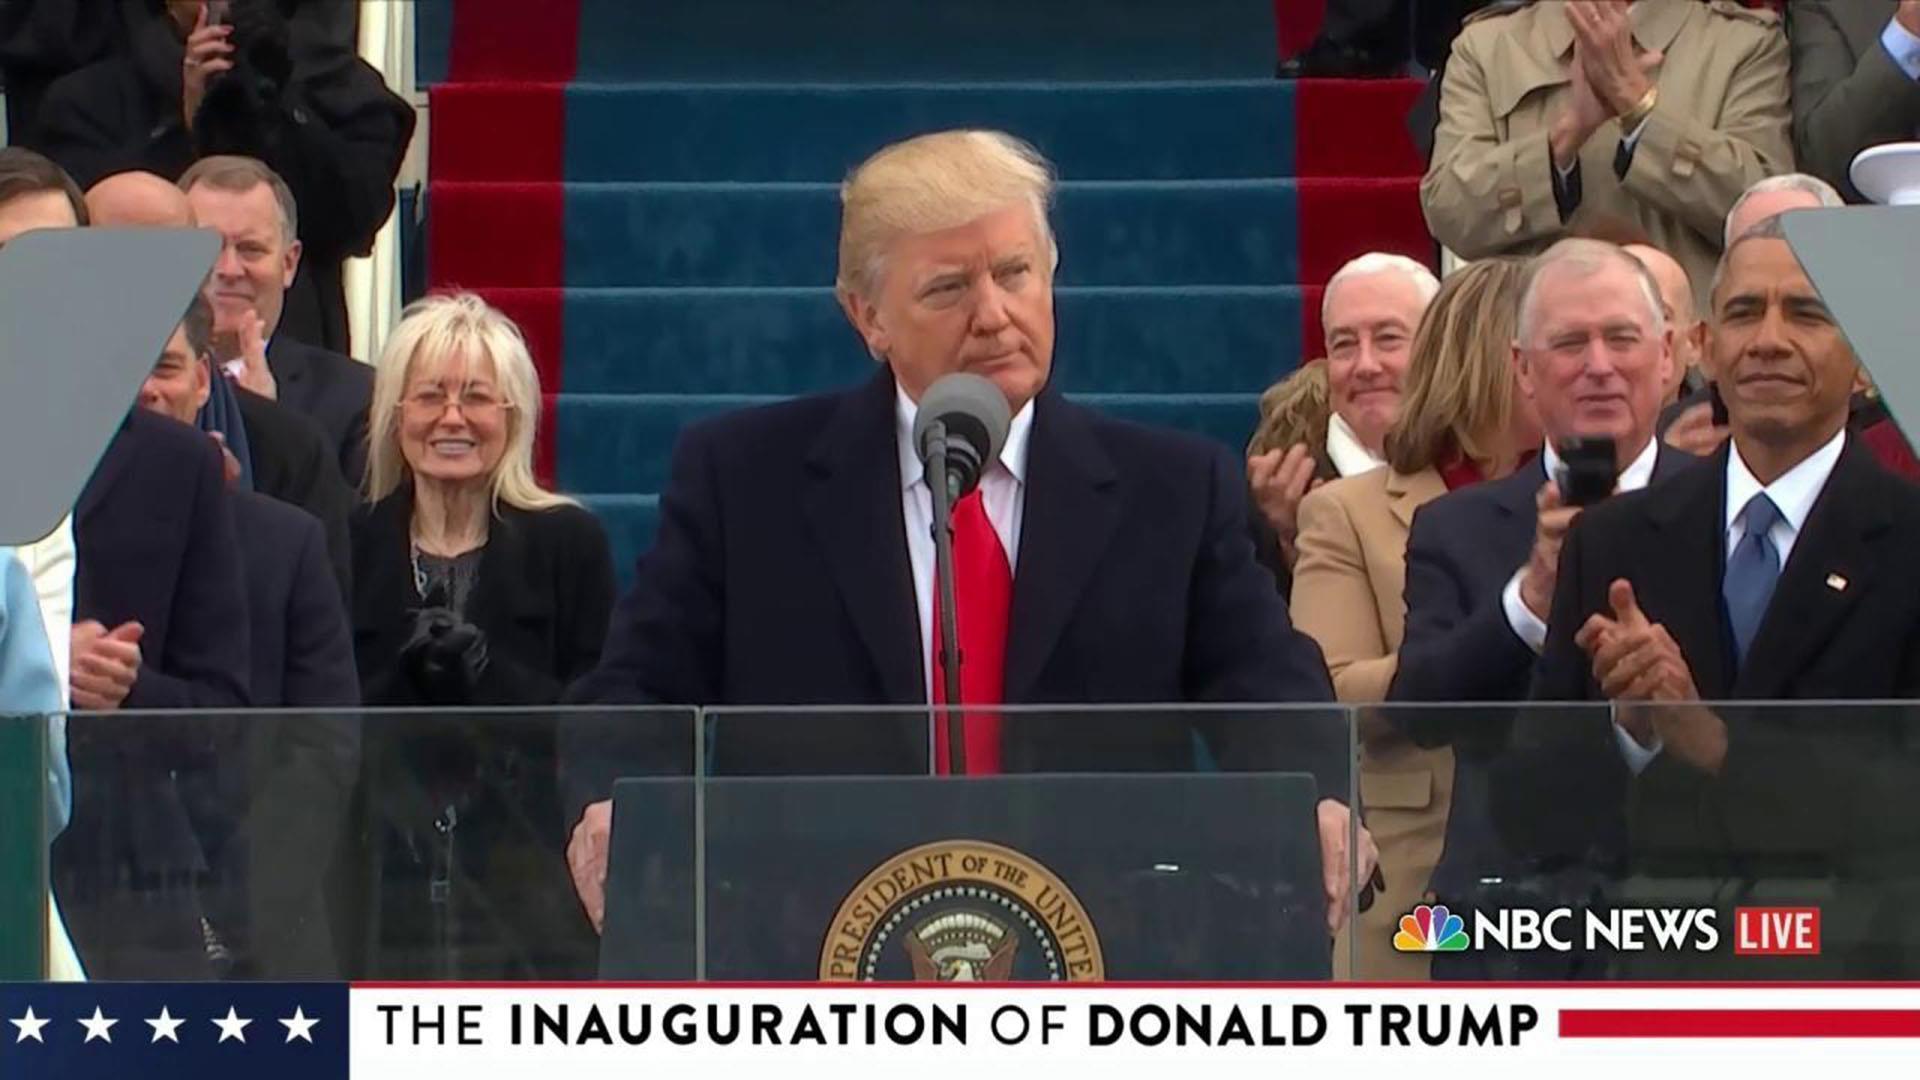 Watch Donald Trump's full inaugural address